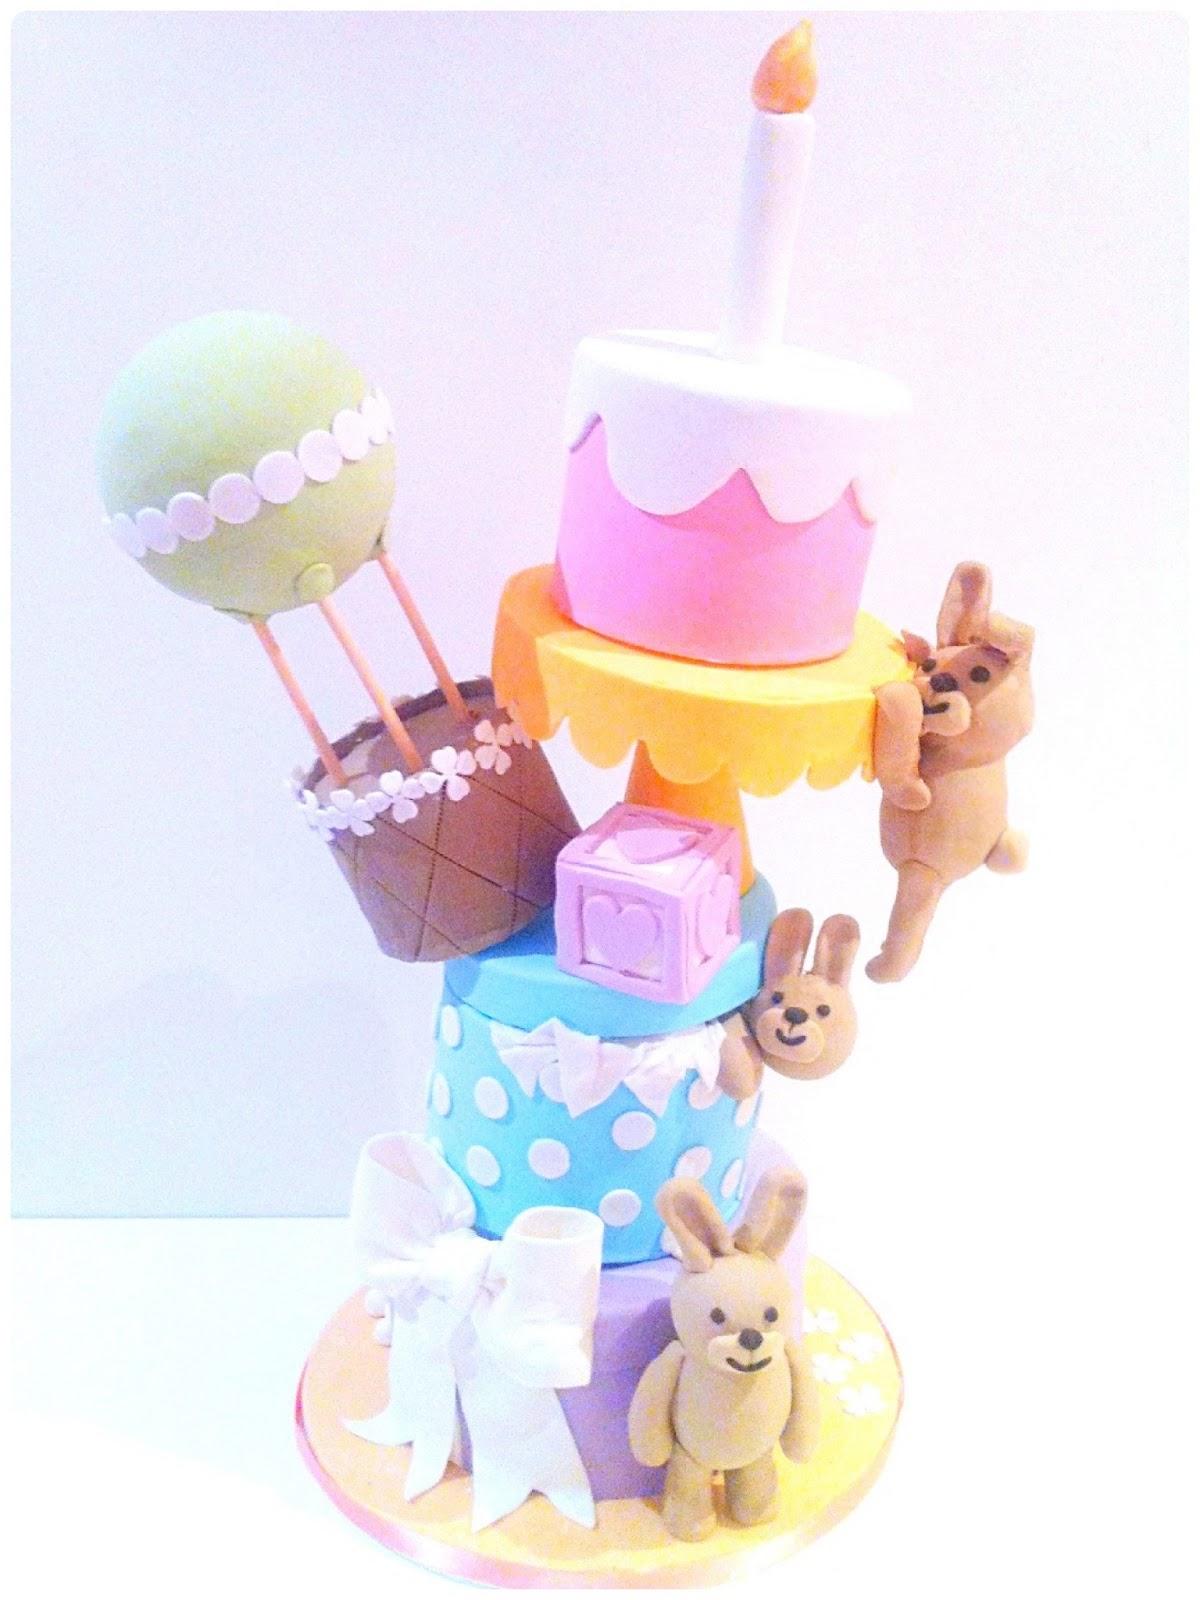 Bunnies Topsy Turvy Birthday Cake London Cherie Kelly